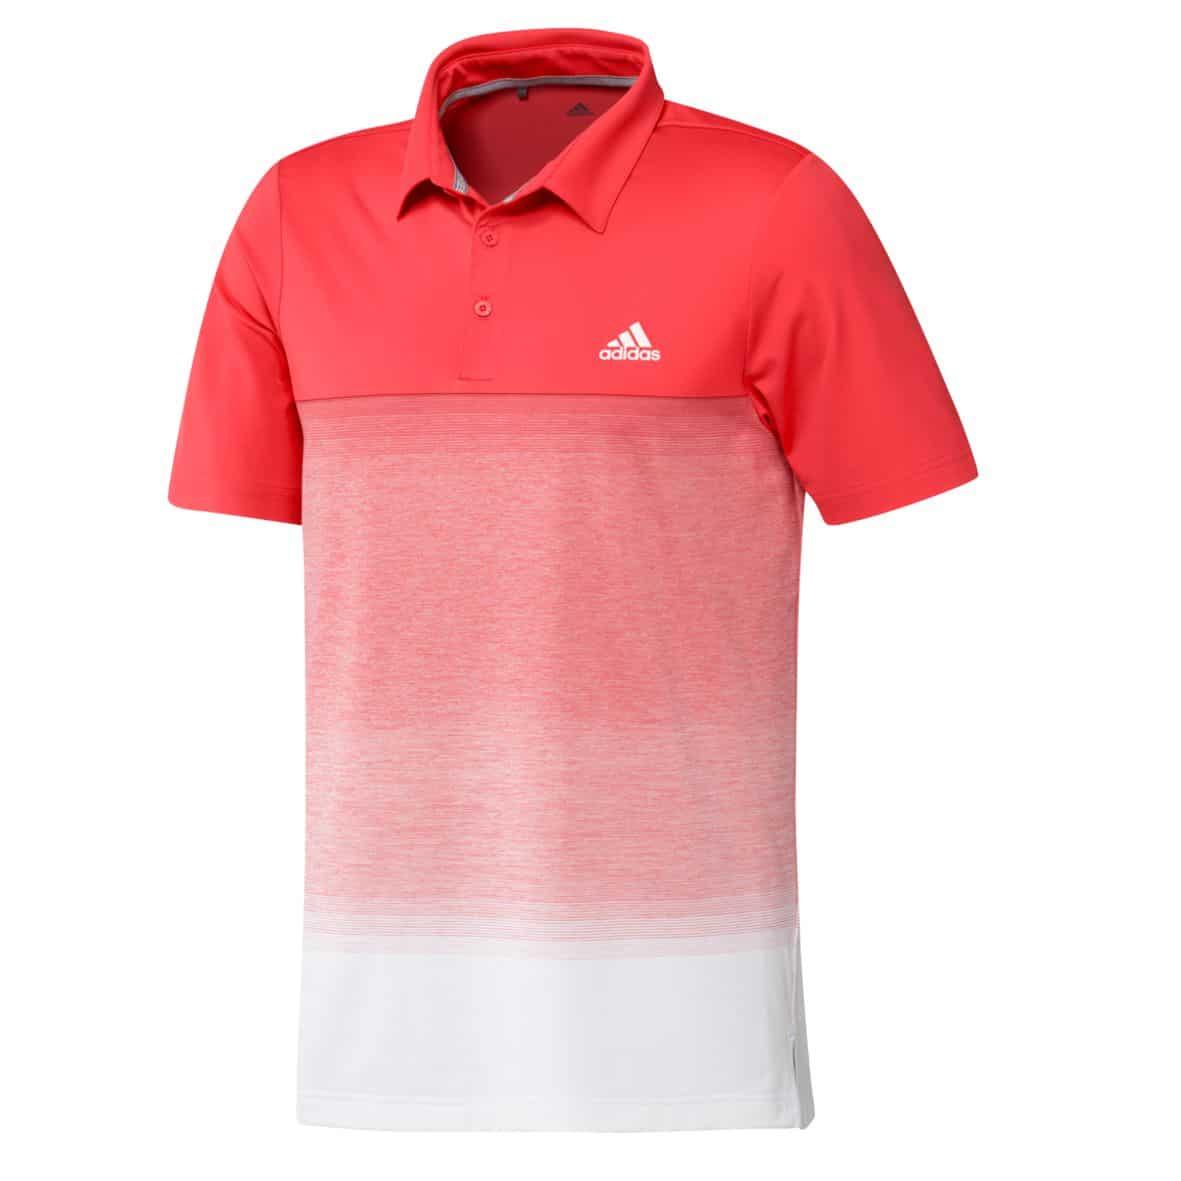 adidas shirt uk